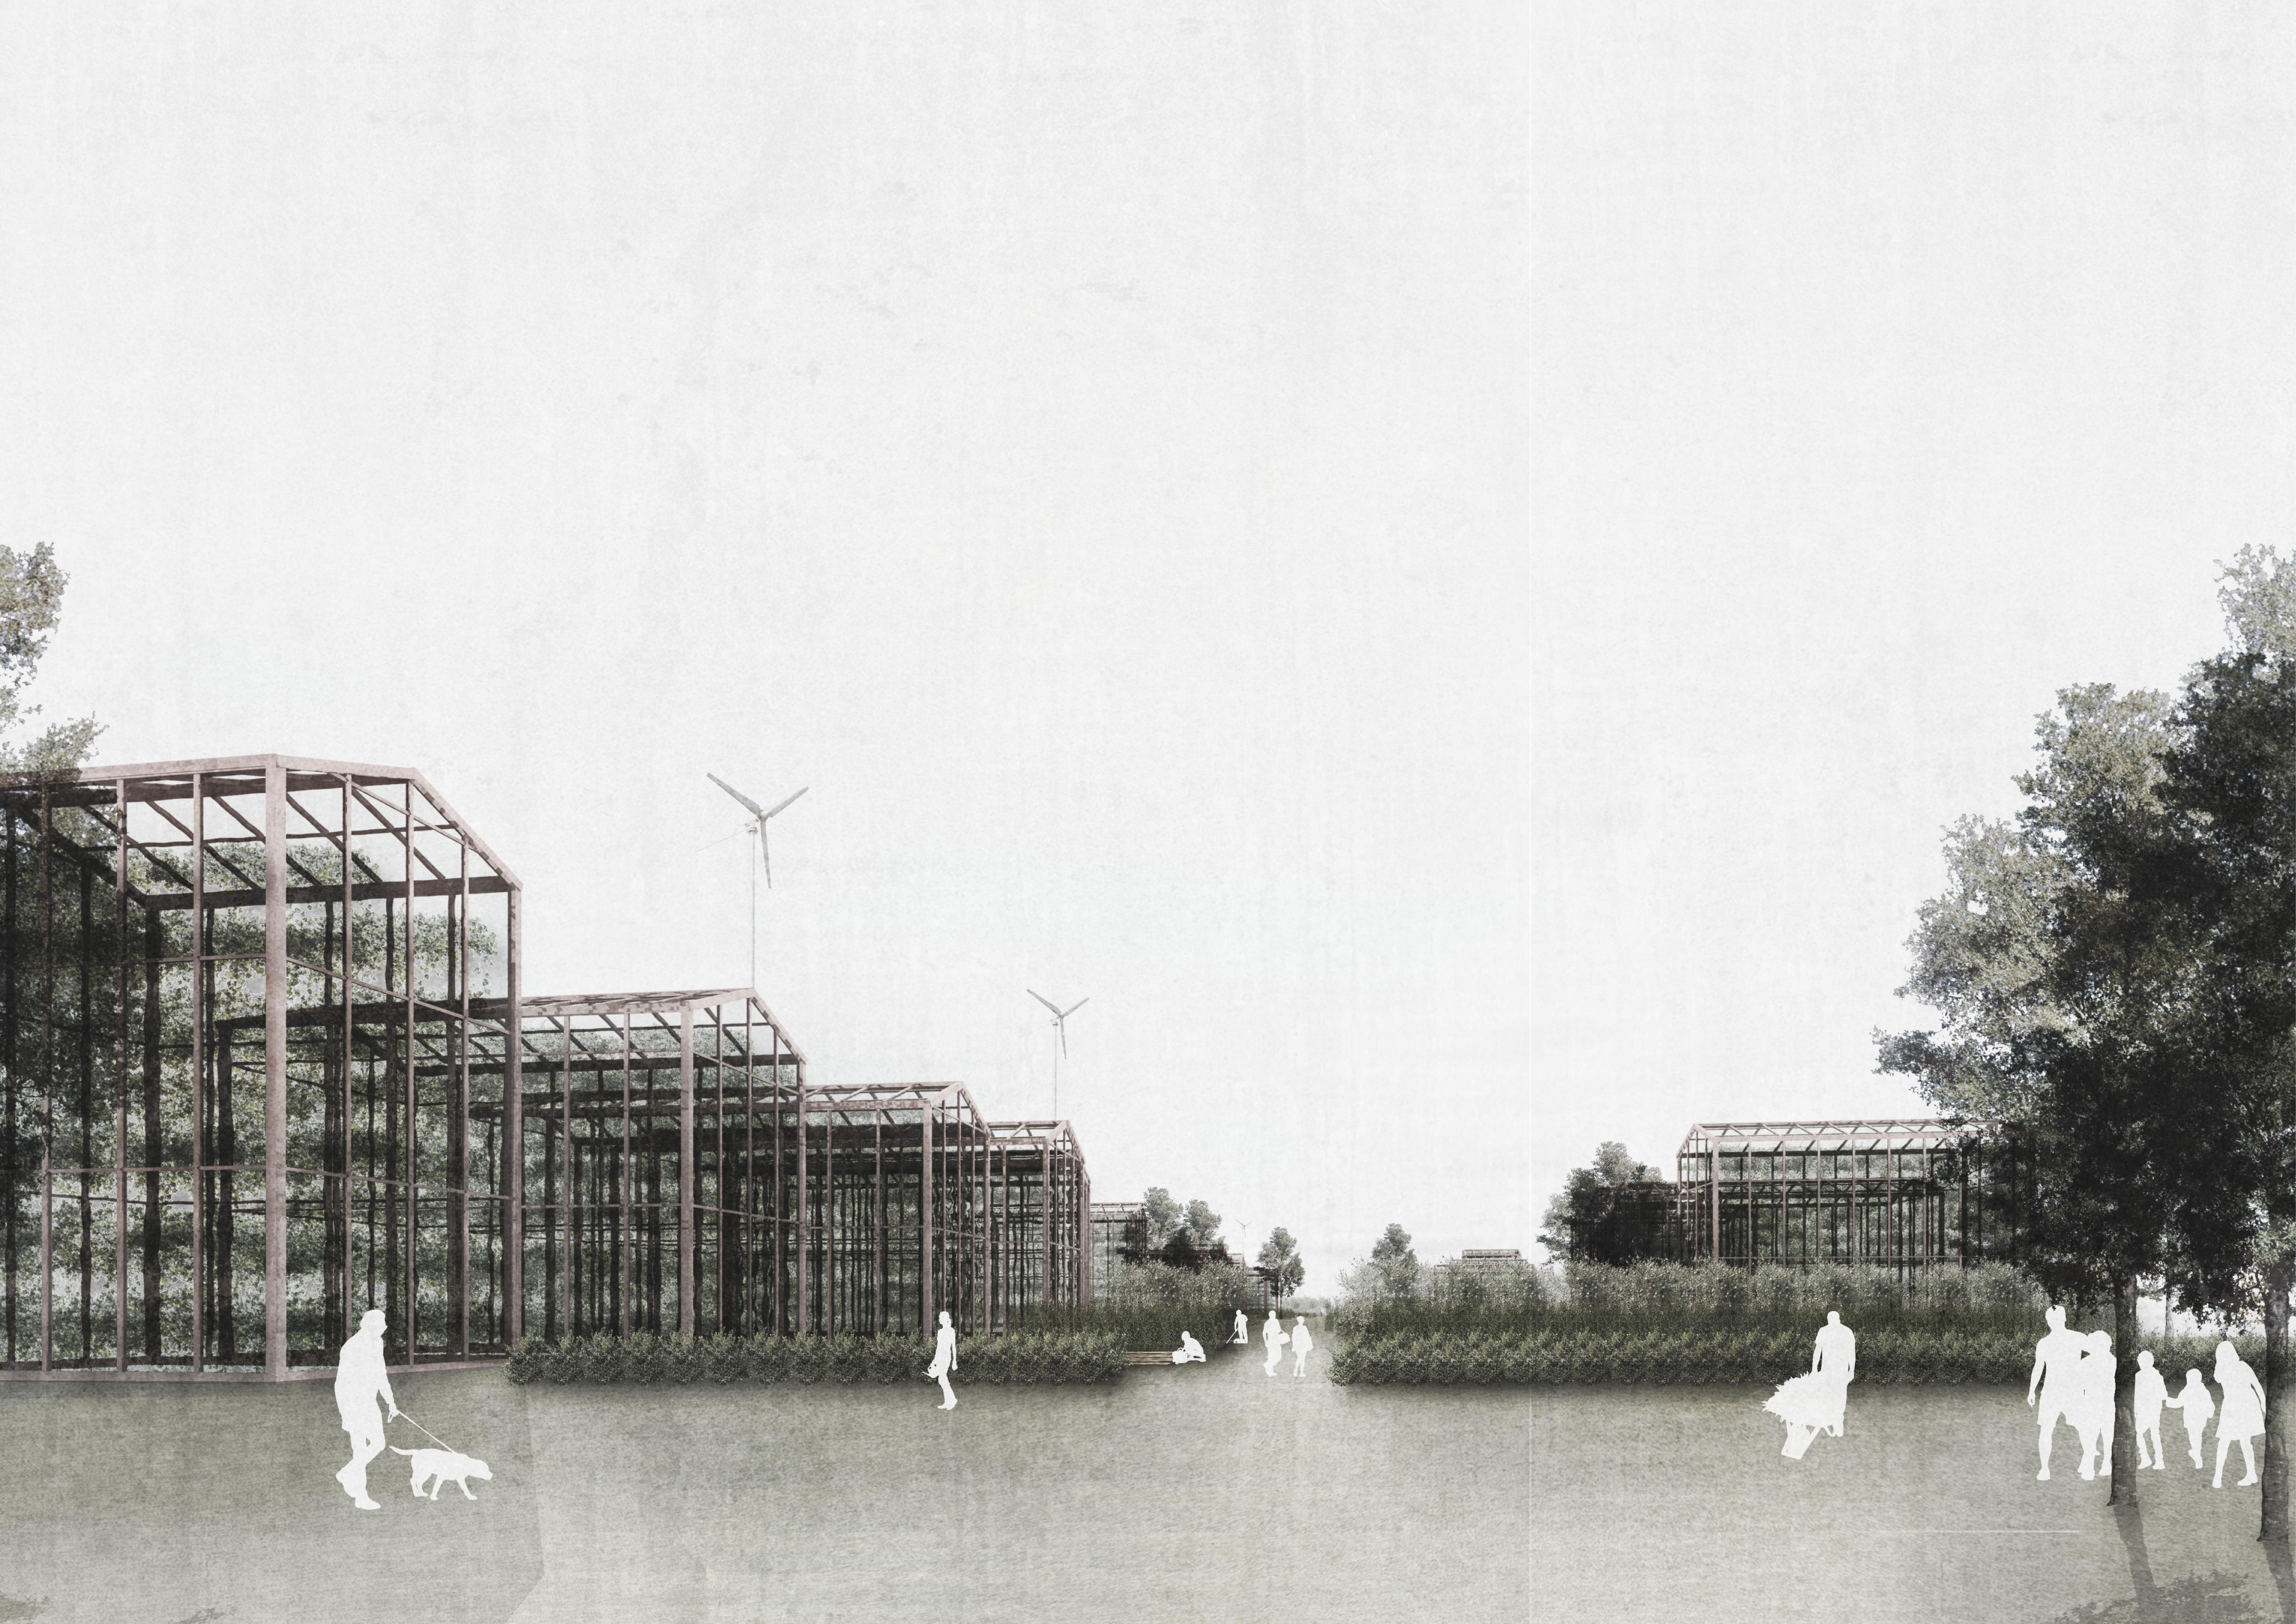 Production farm